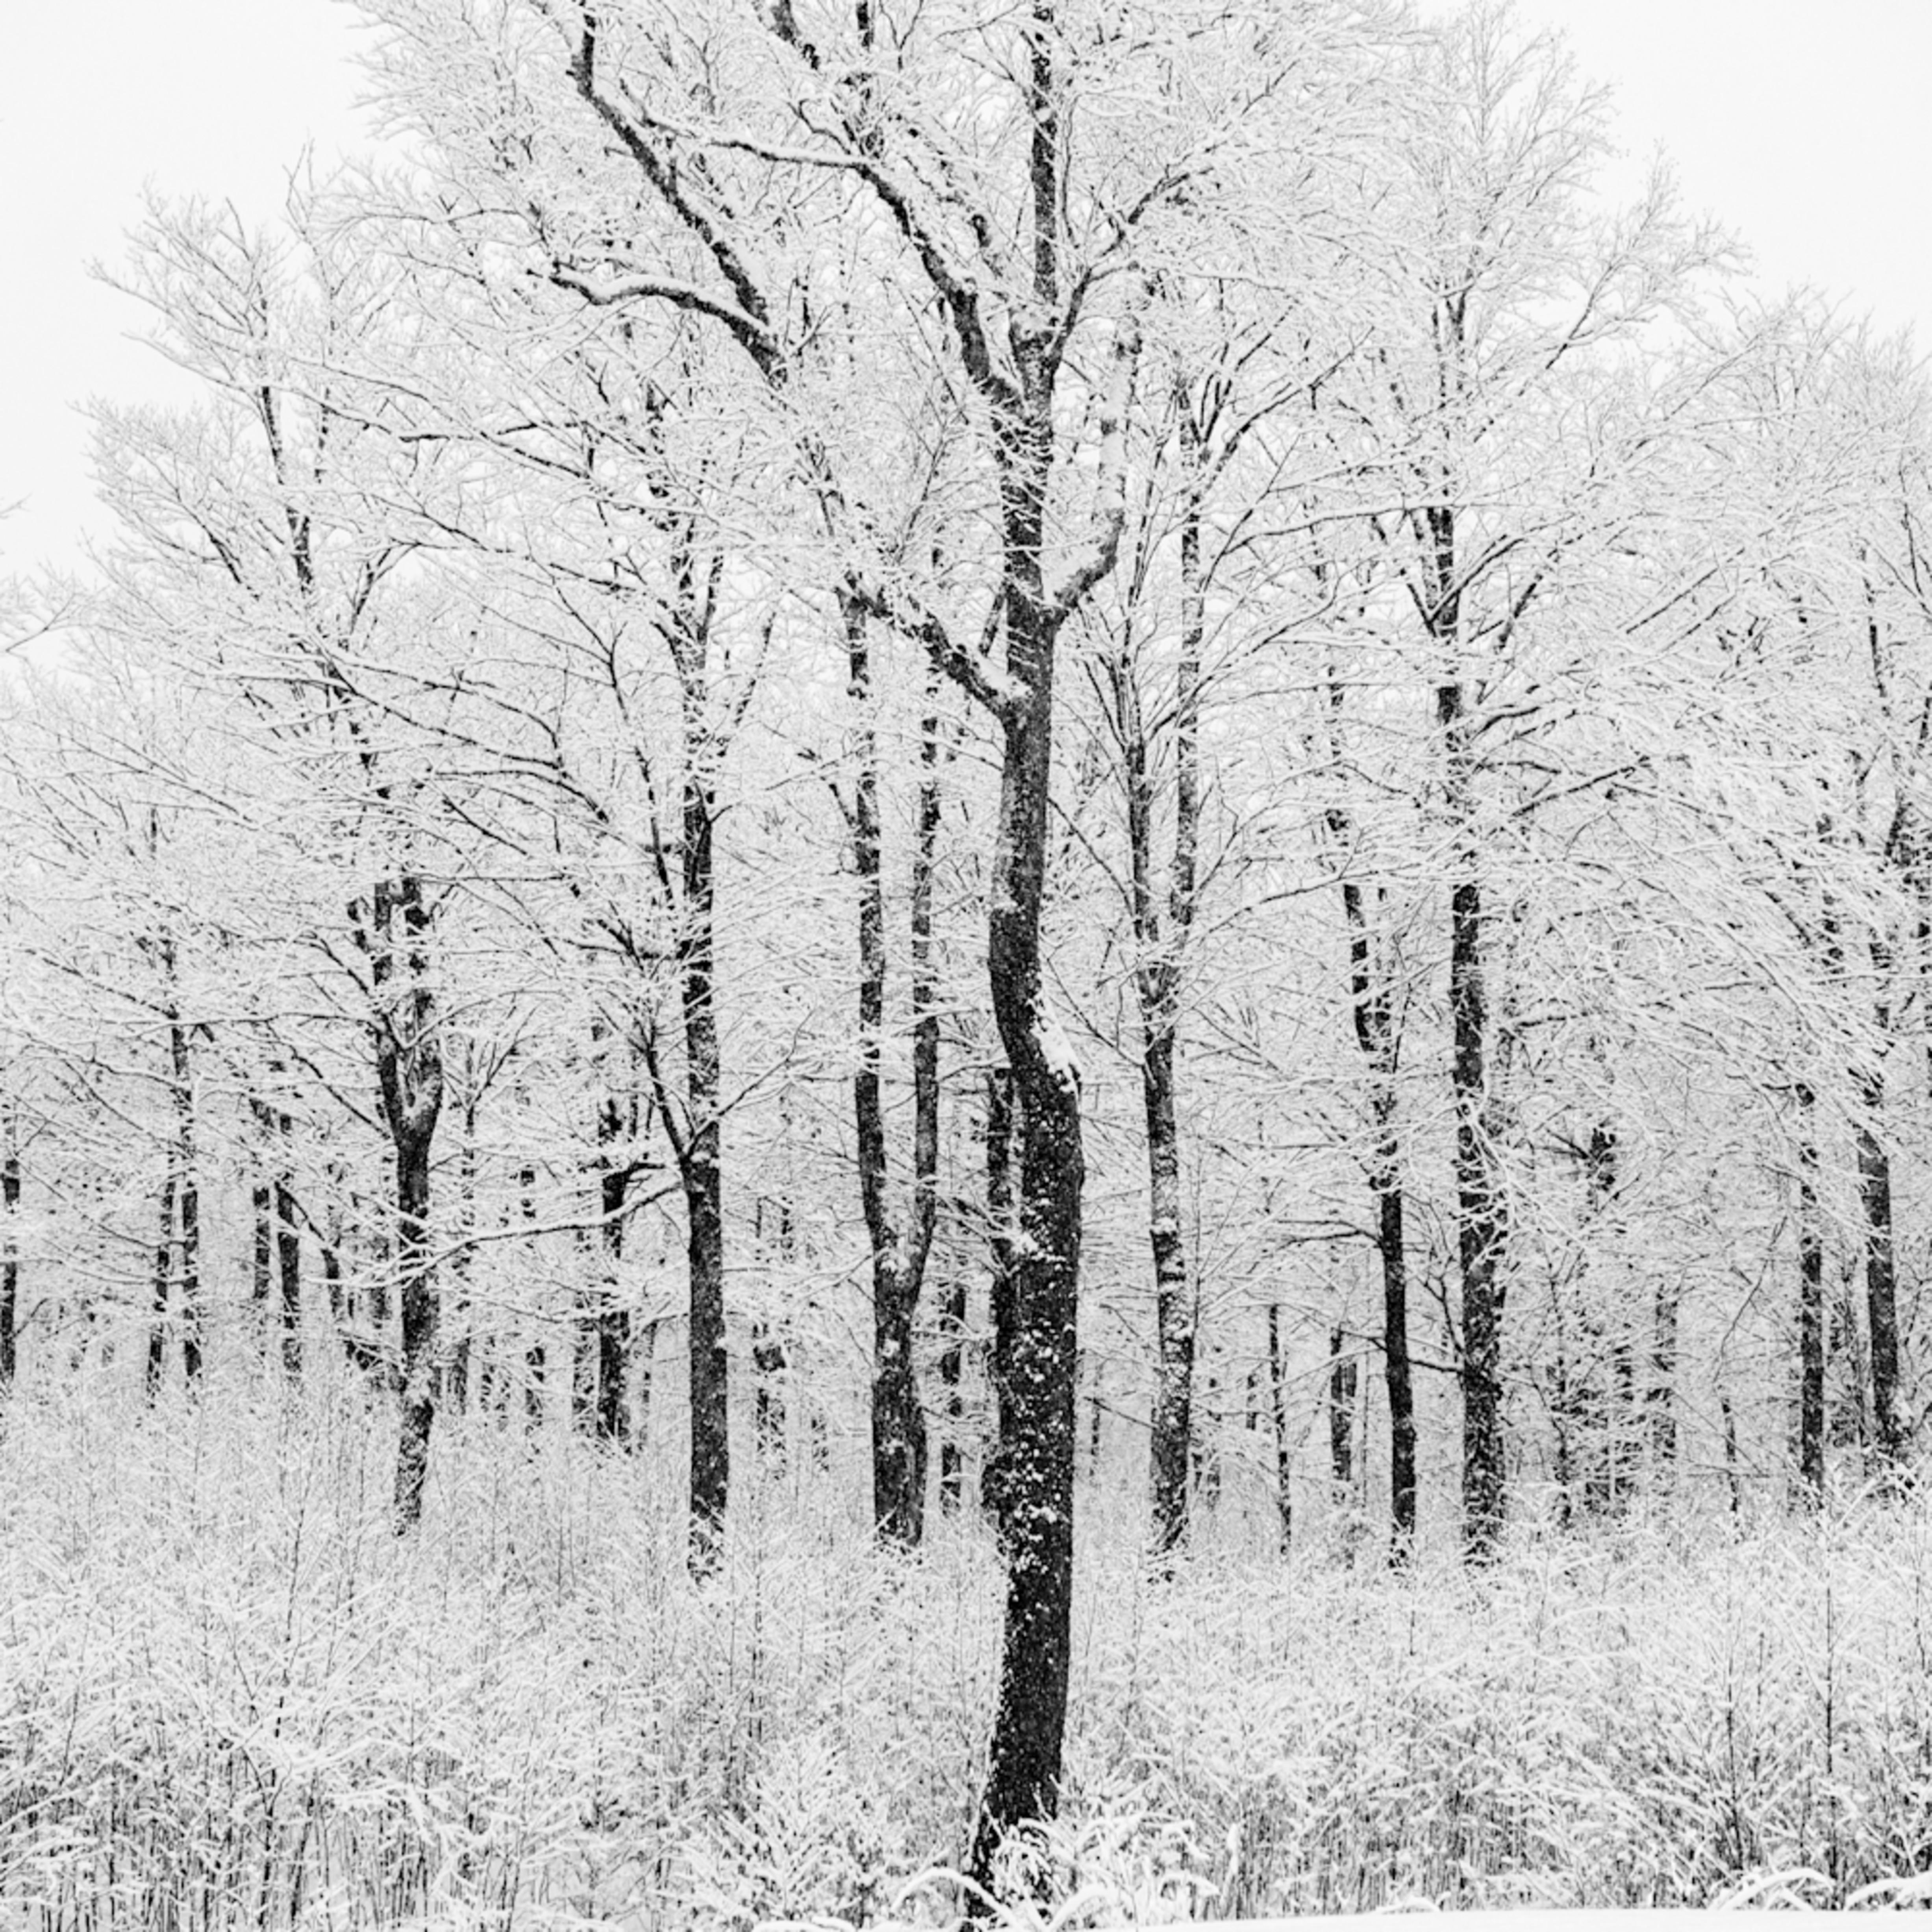 Bw winter trees v1 gidp27